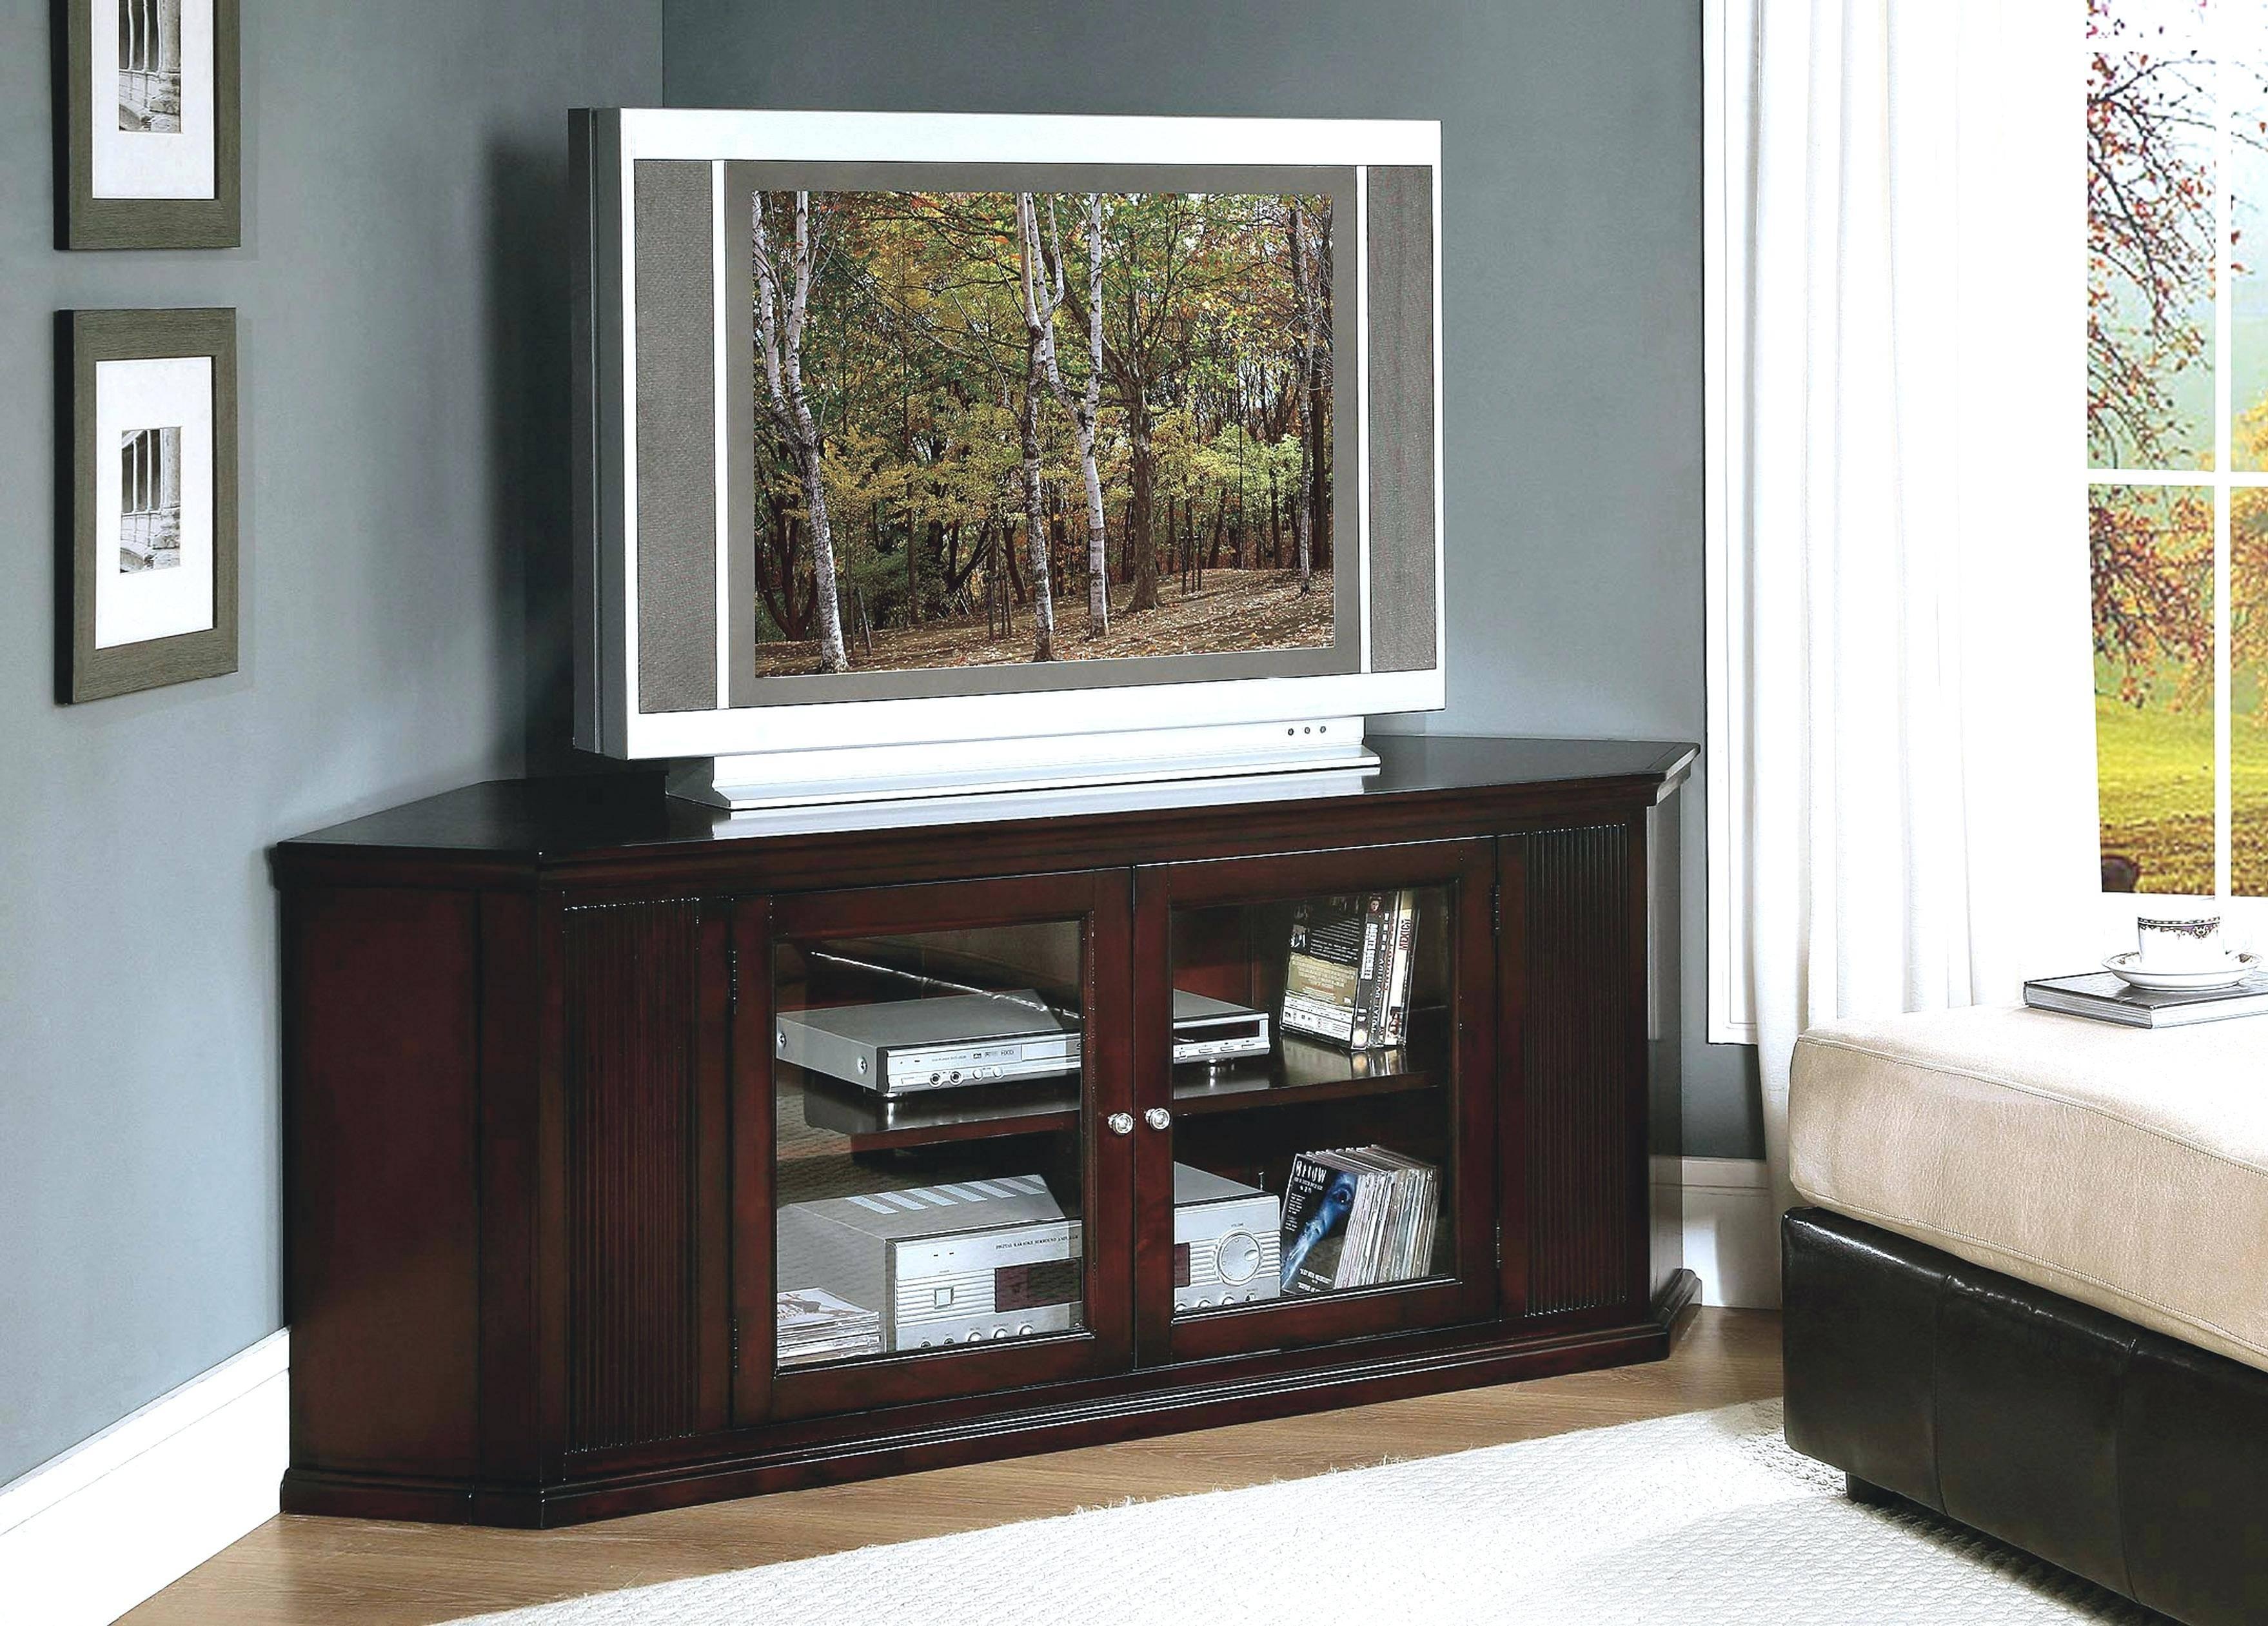 Tv Stand : Oak Corner Tv Stand 55 Fascinating Tall Corner Tv Regarding Corner Tv Cabinets For Flat Screen (View 3 of 15)